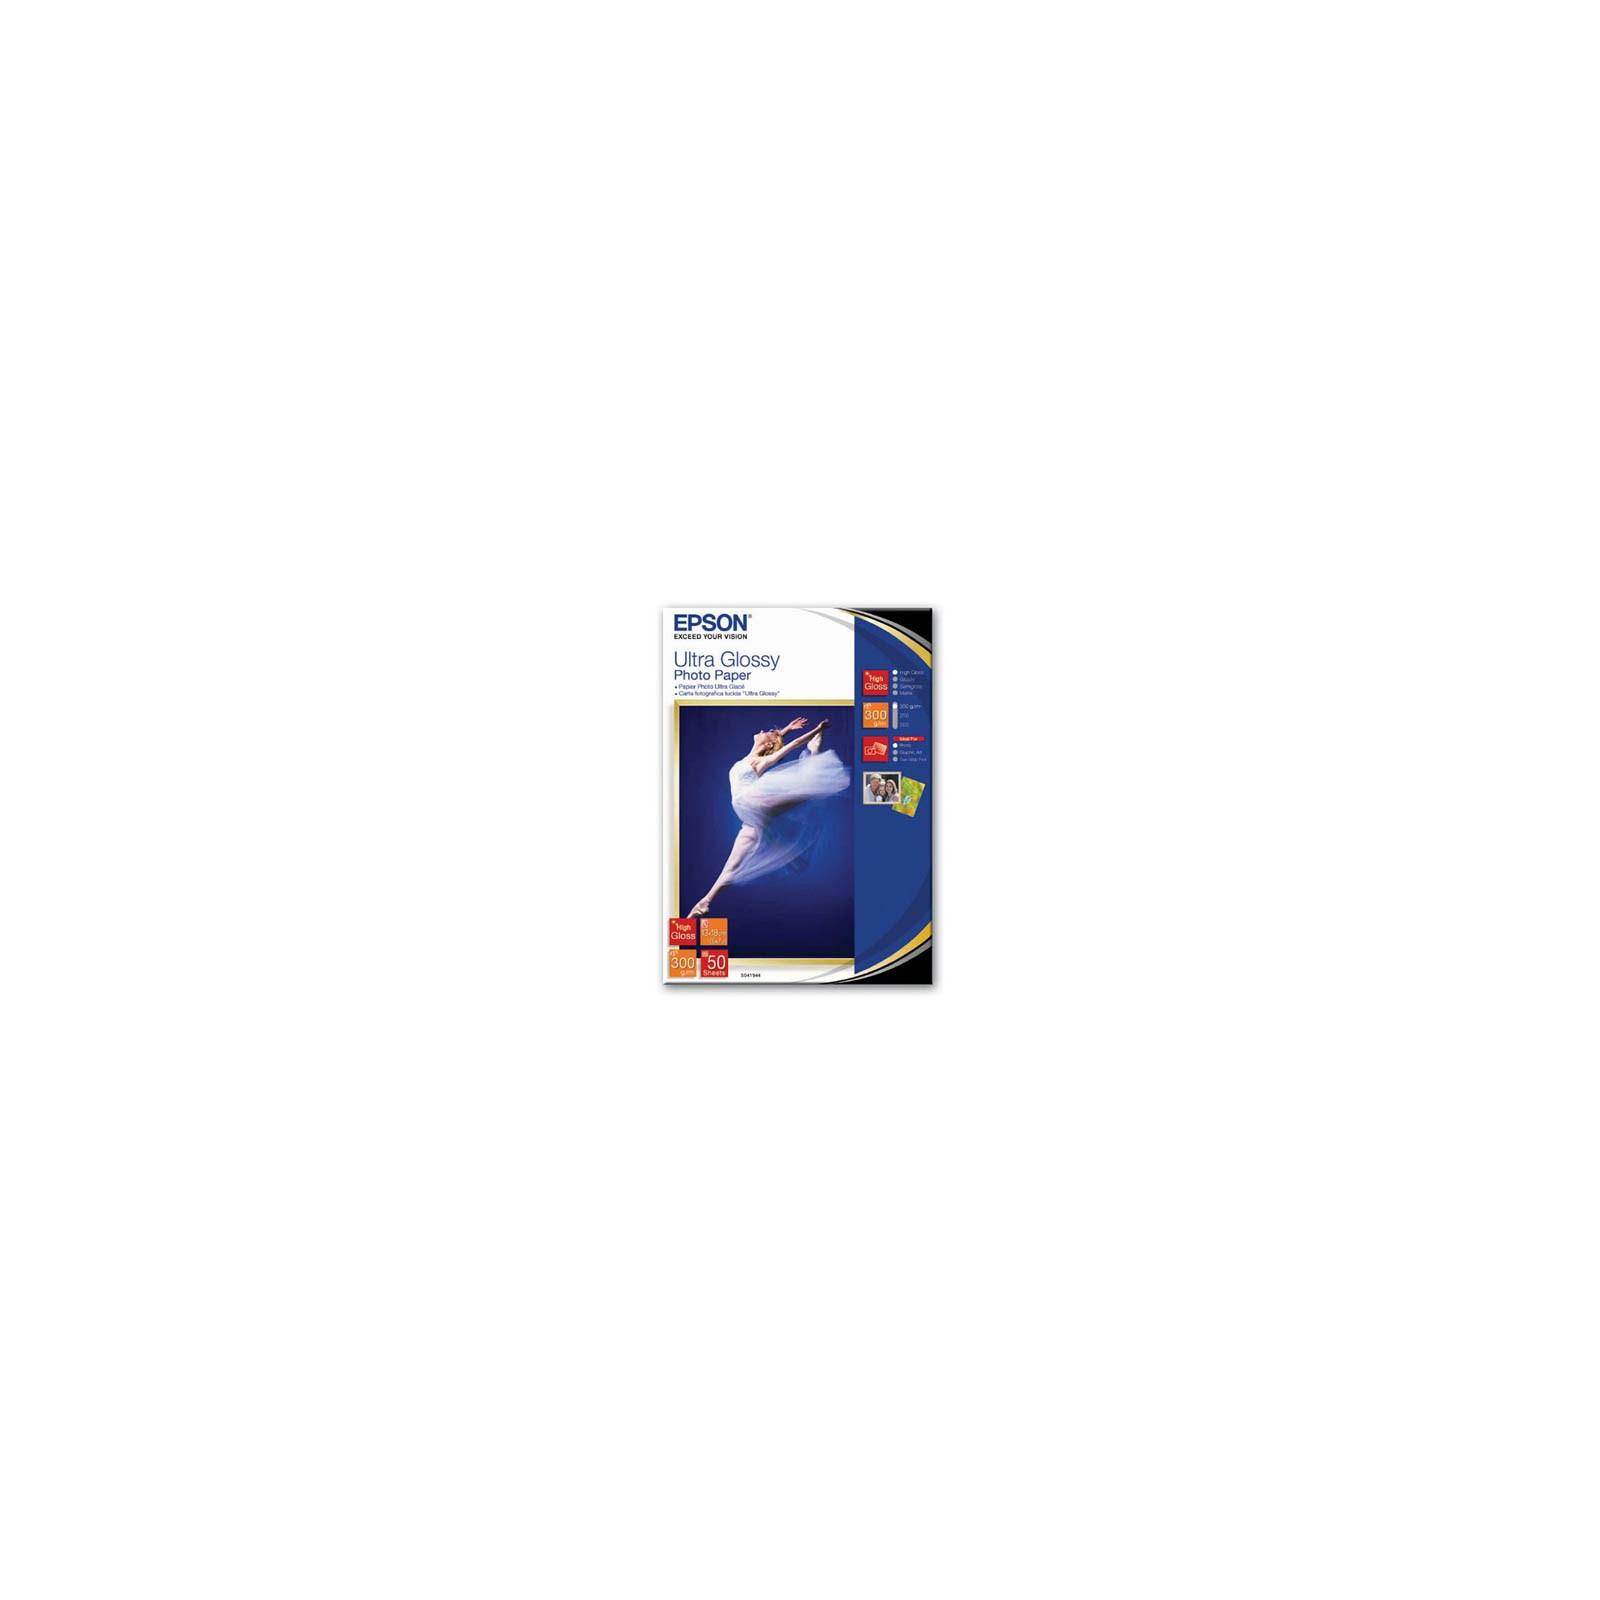 Бумага EPSON 13х18 Ultra Glossy (C13S041944)